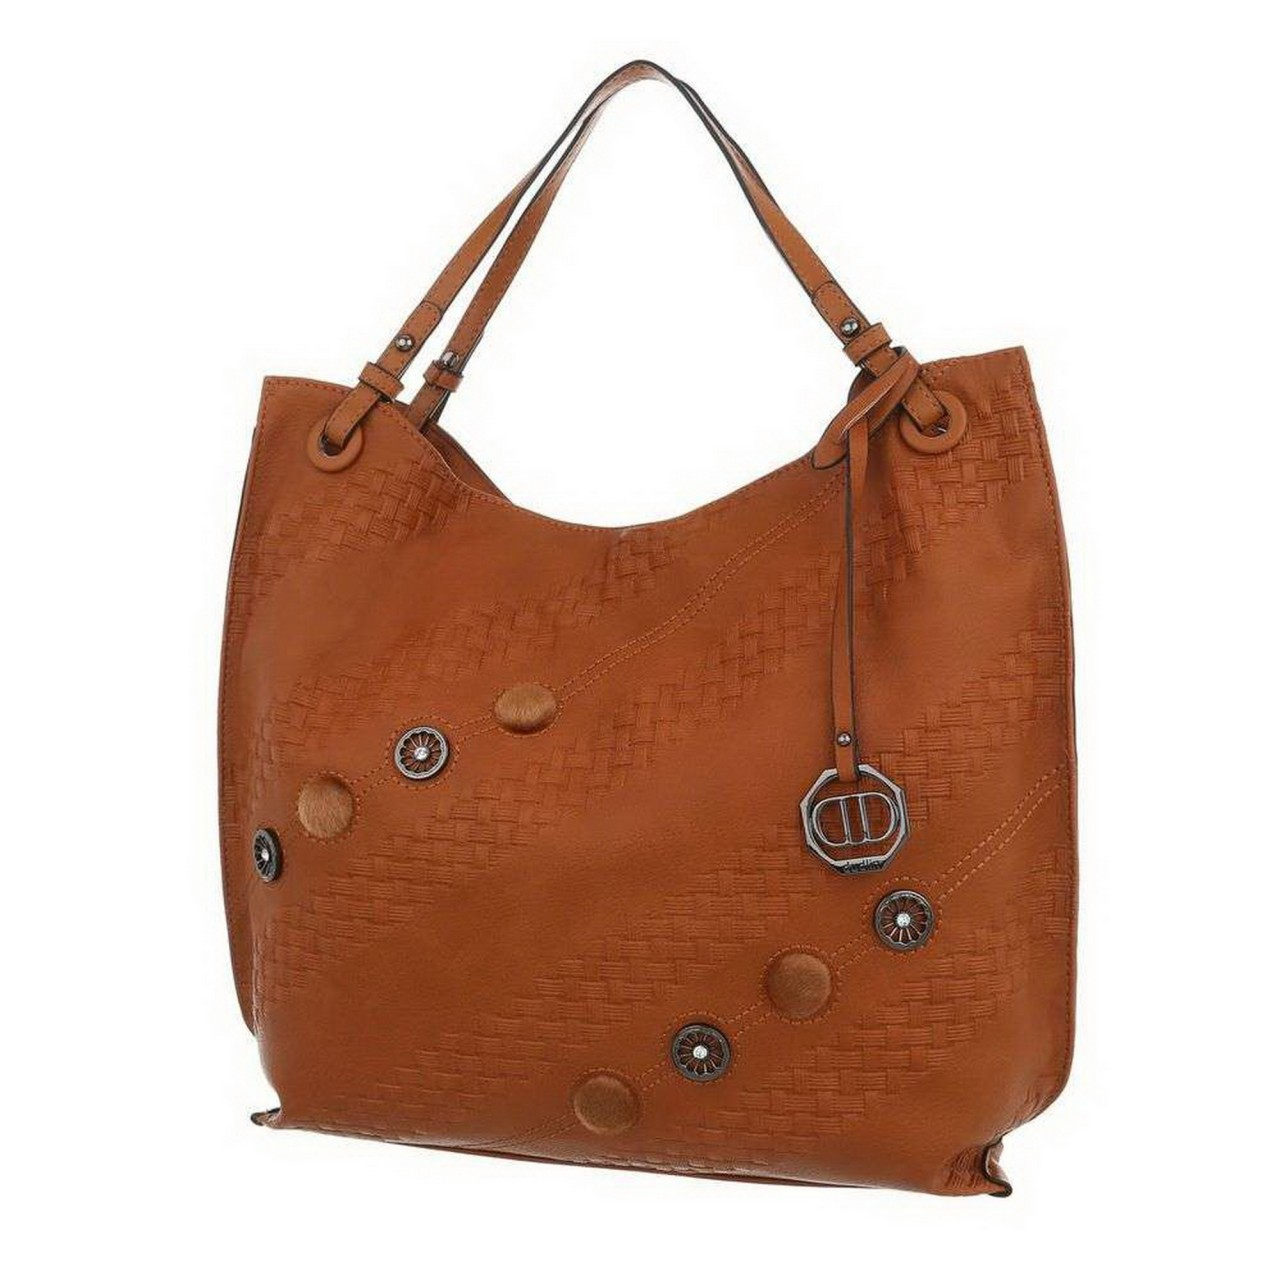 Damen Shopper- brown